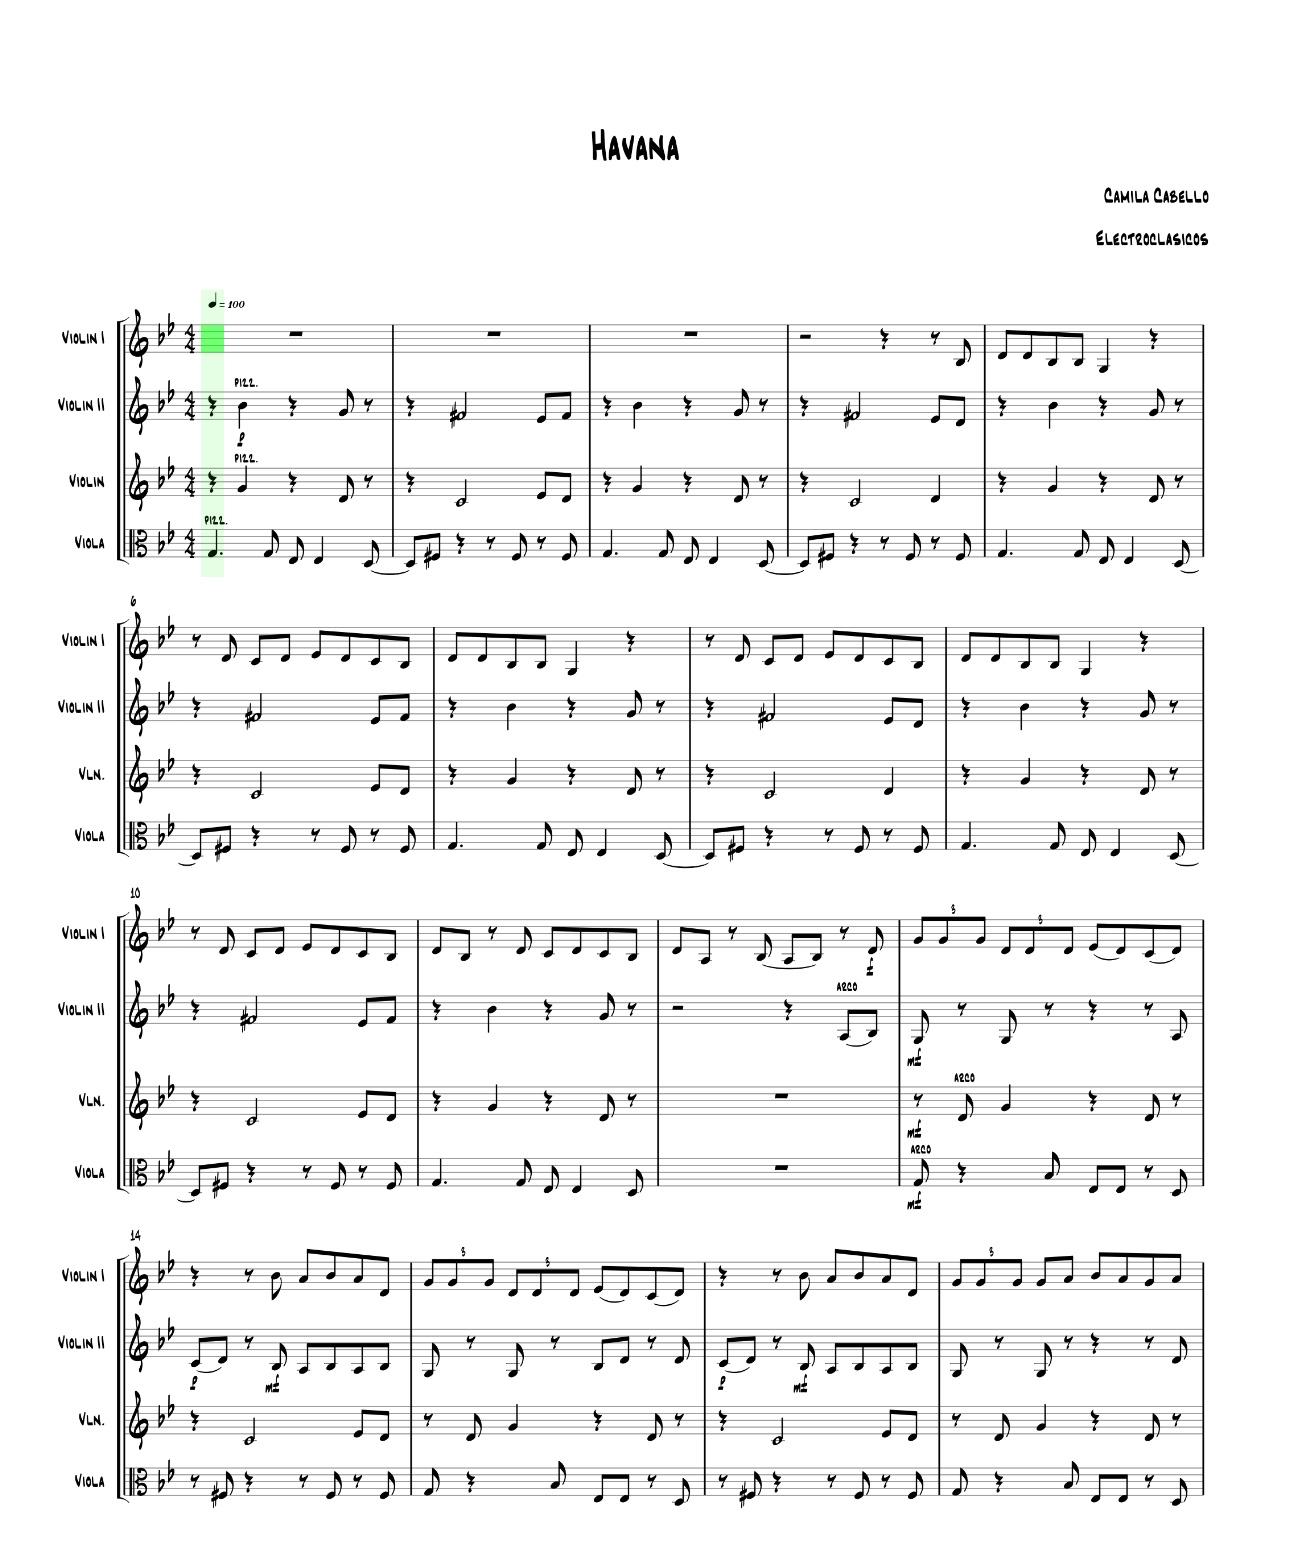 Sheet Music String Quartet Havana, Camila Cabello